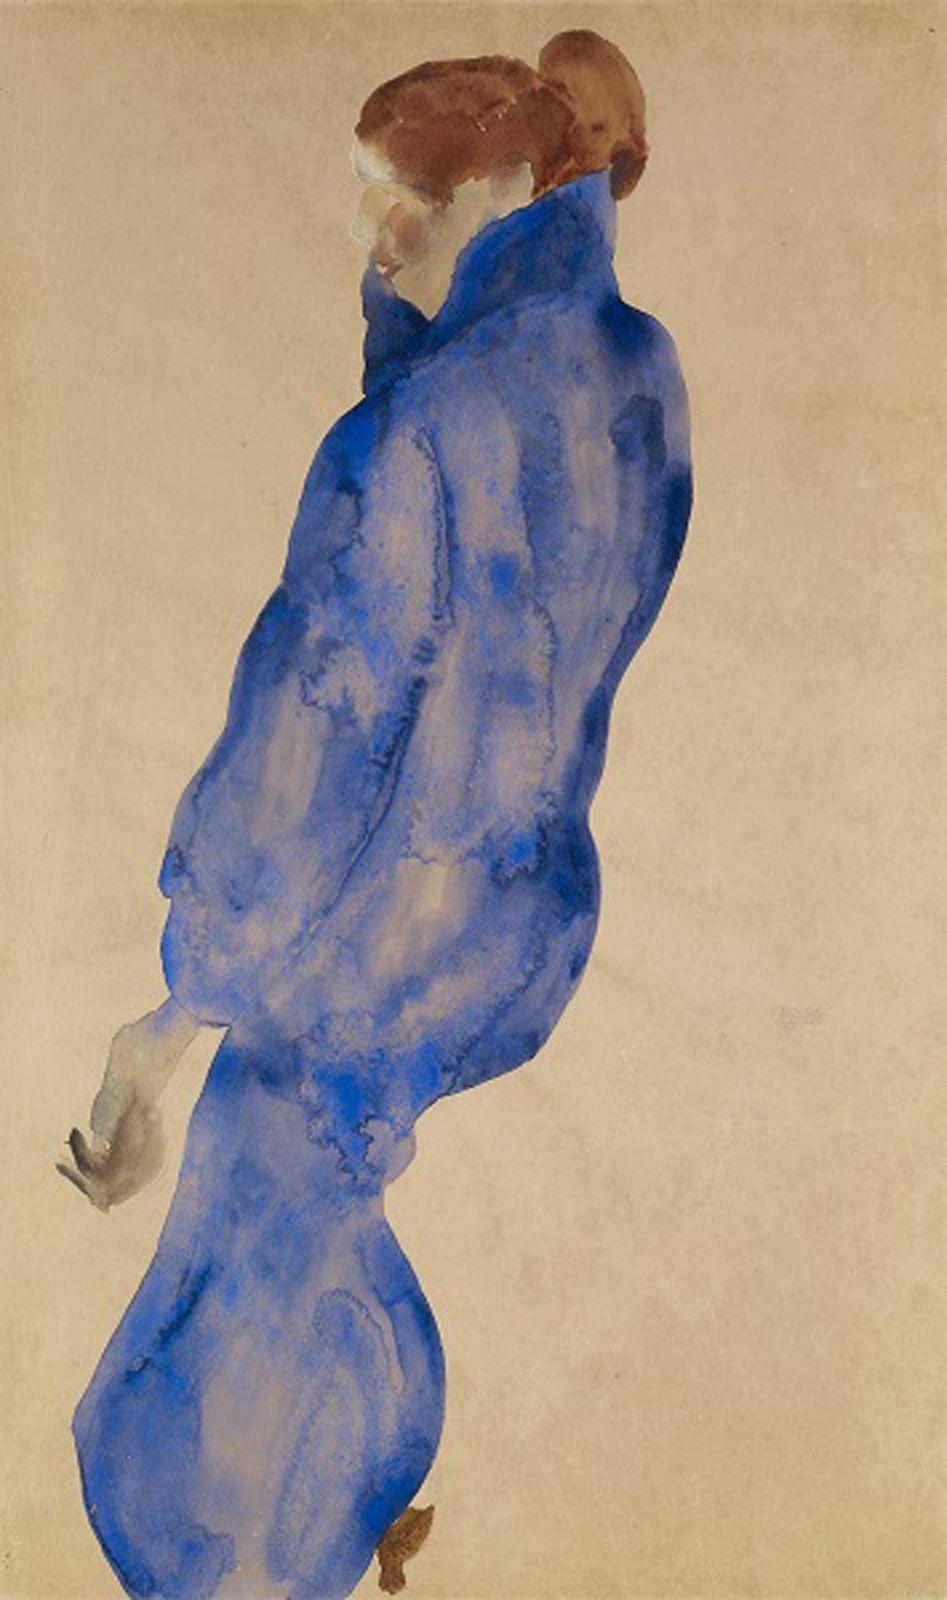 """Femme à la robe Bleue"", 1911 d'Egon Schiele - Courtesy Collection Alicia KOPLOWITZ - Grupo Omega Capital"